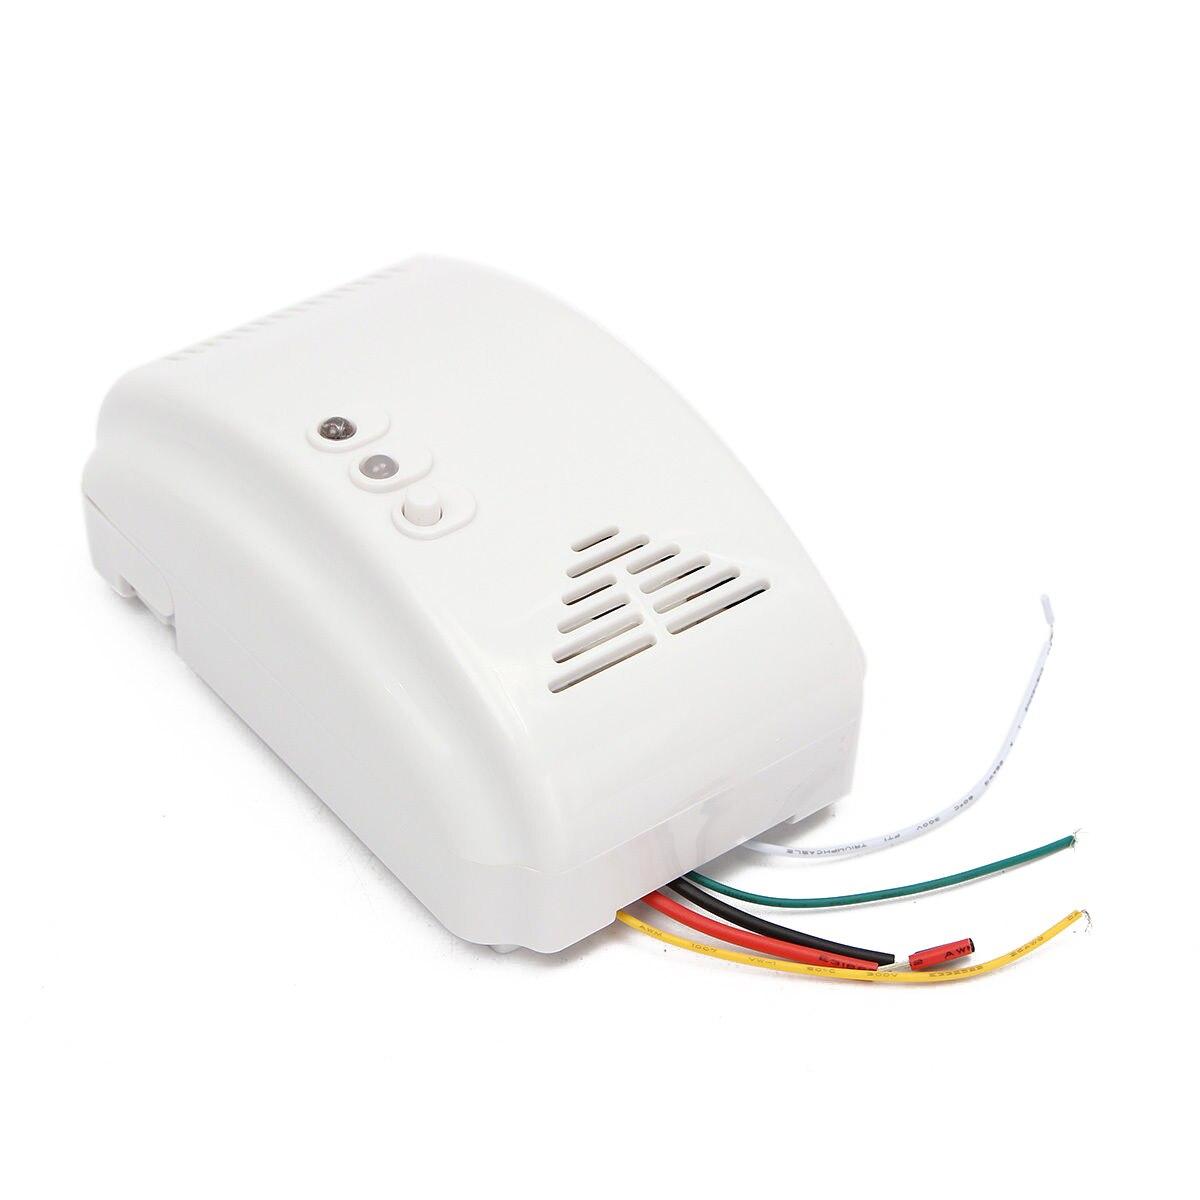 1pc Mayitr High Quality White Gas Leak Sensor Alarm 12V Propane Coal Butane LPG Natural Wall-mounted Gas Detector 115*72*41mm